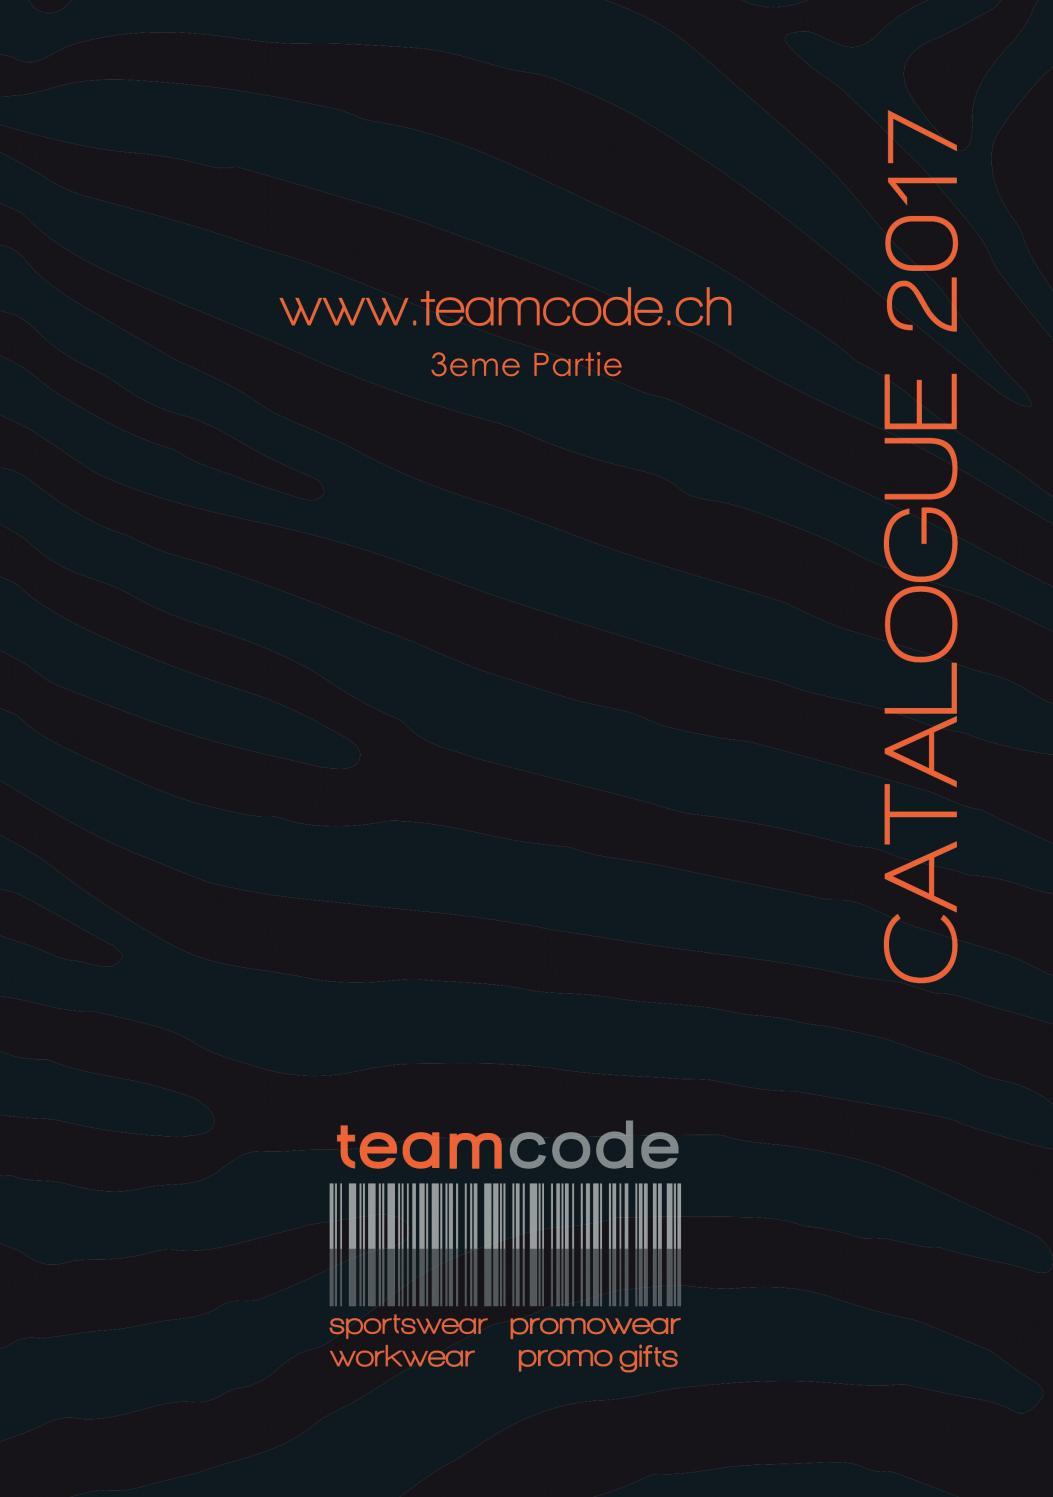 Teamcode3 by teamcode - issuu 2260b46a143